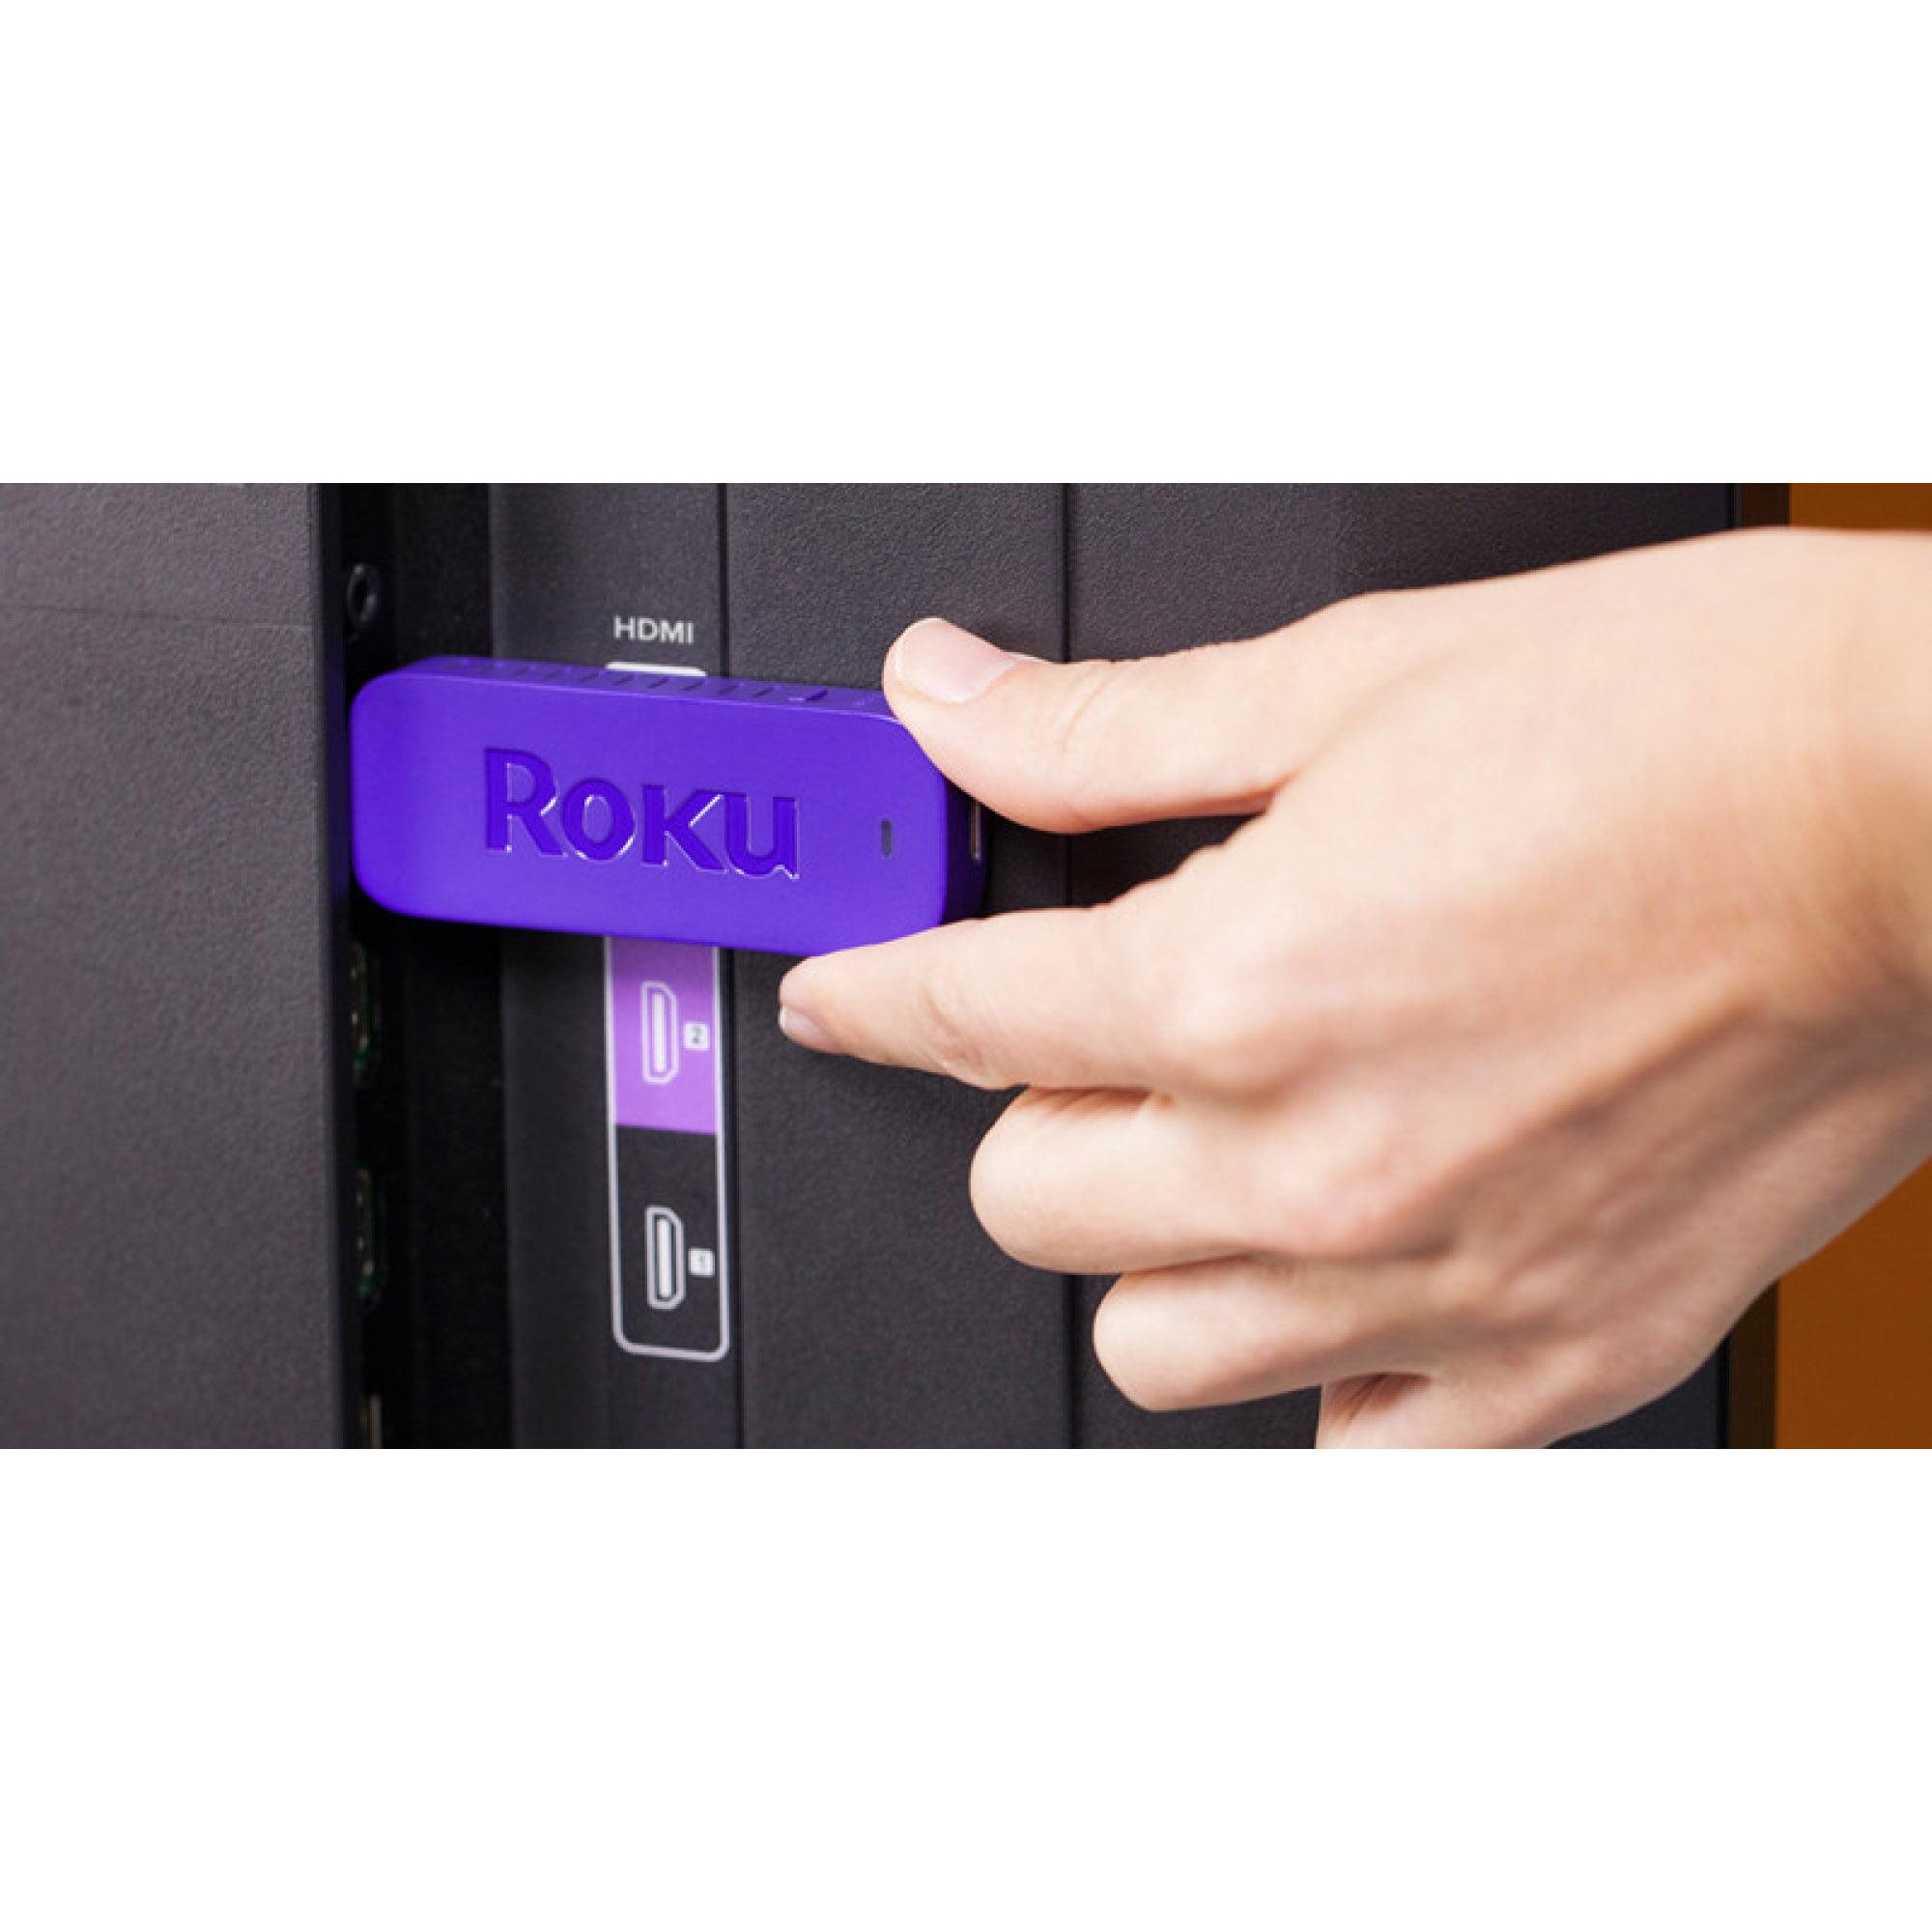 Roku 3500 Streaming Stick (HDMI) (Certified Refurbished)